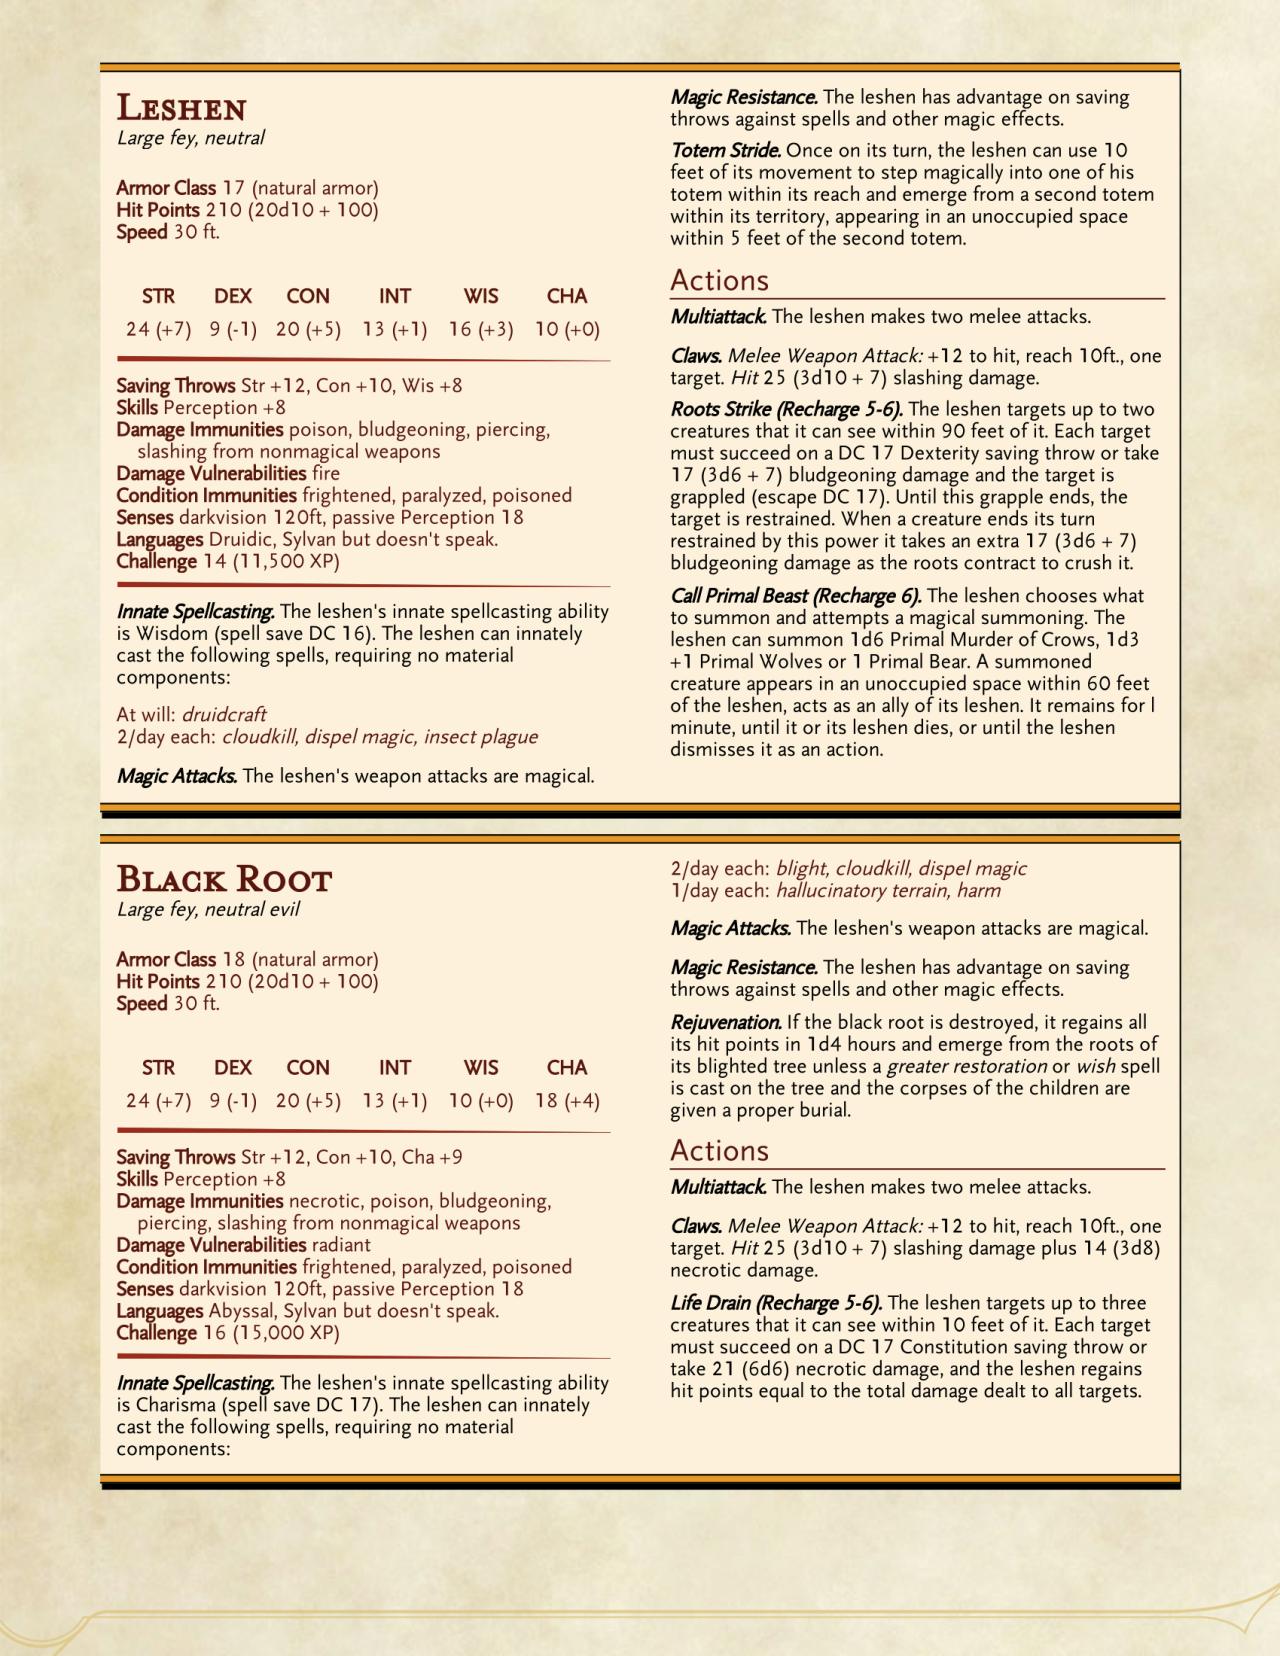 DnD 5e Homebrew — StoneStrix Monsters: Beast of Ill Omen